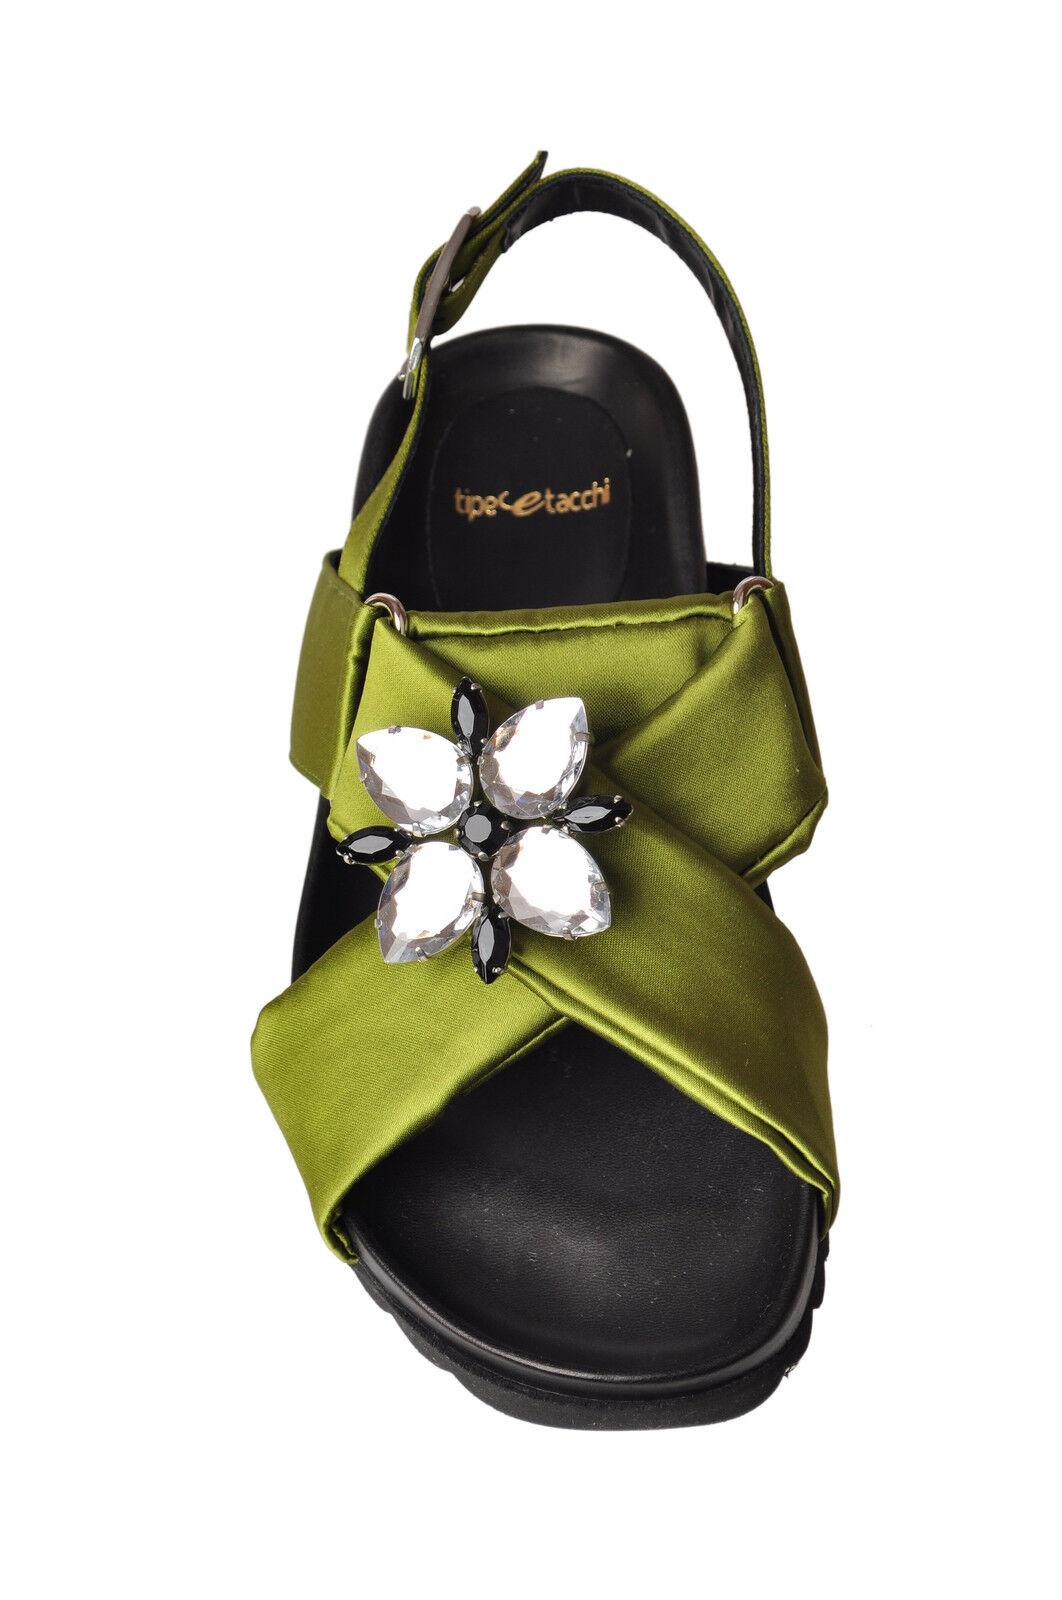 Tipe E Tacchi - Schuhe-Sandalen - Frau - - Grün - - 1897112F184344 46b6bd